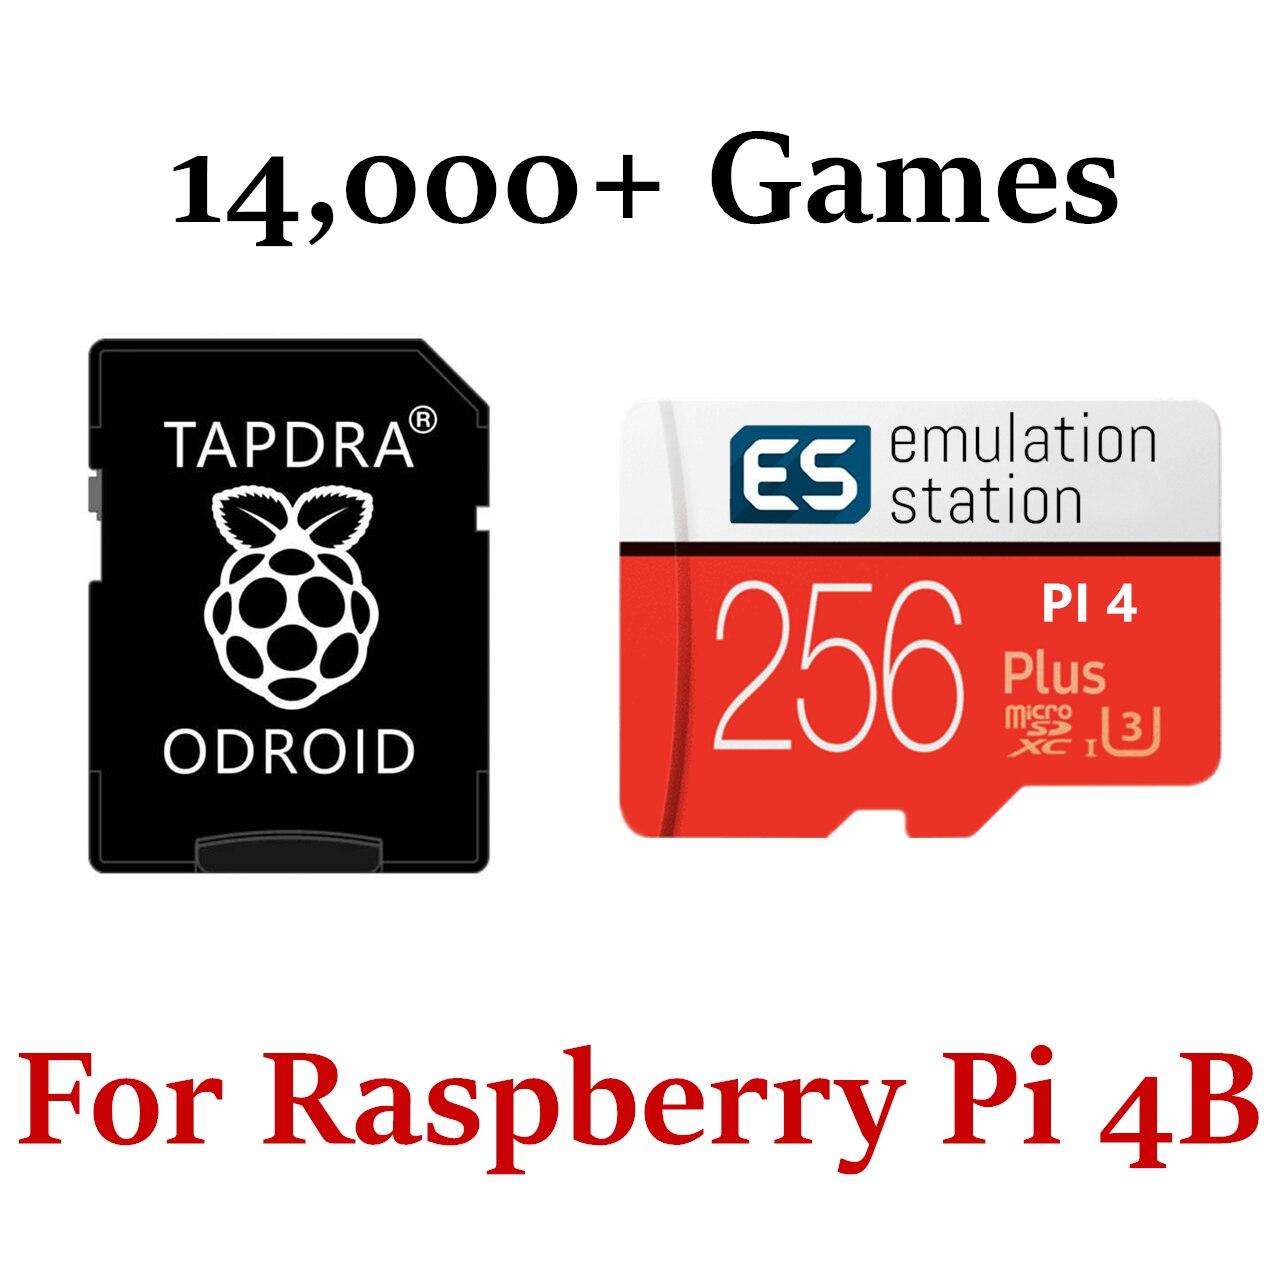 256 гб Micro SD карта Retropie 4,6 станция эмуляции для Raspberry Pi 4 3D Boxart Video Previews - 14000 + игры 50 System